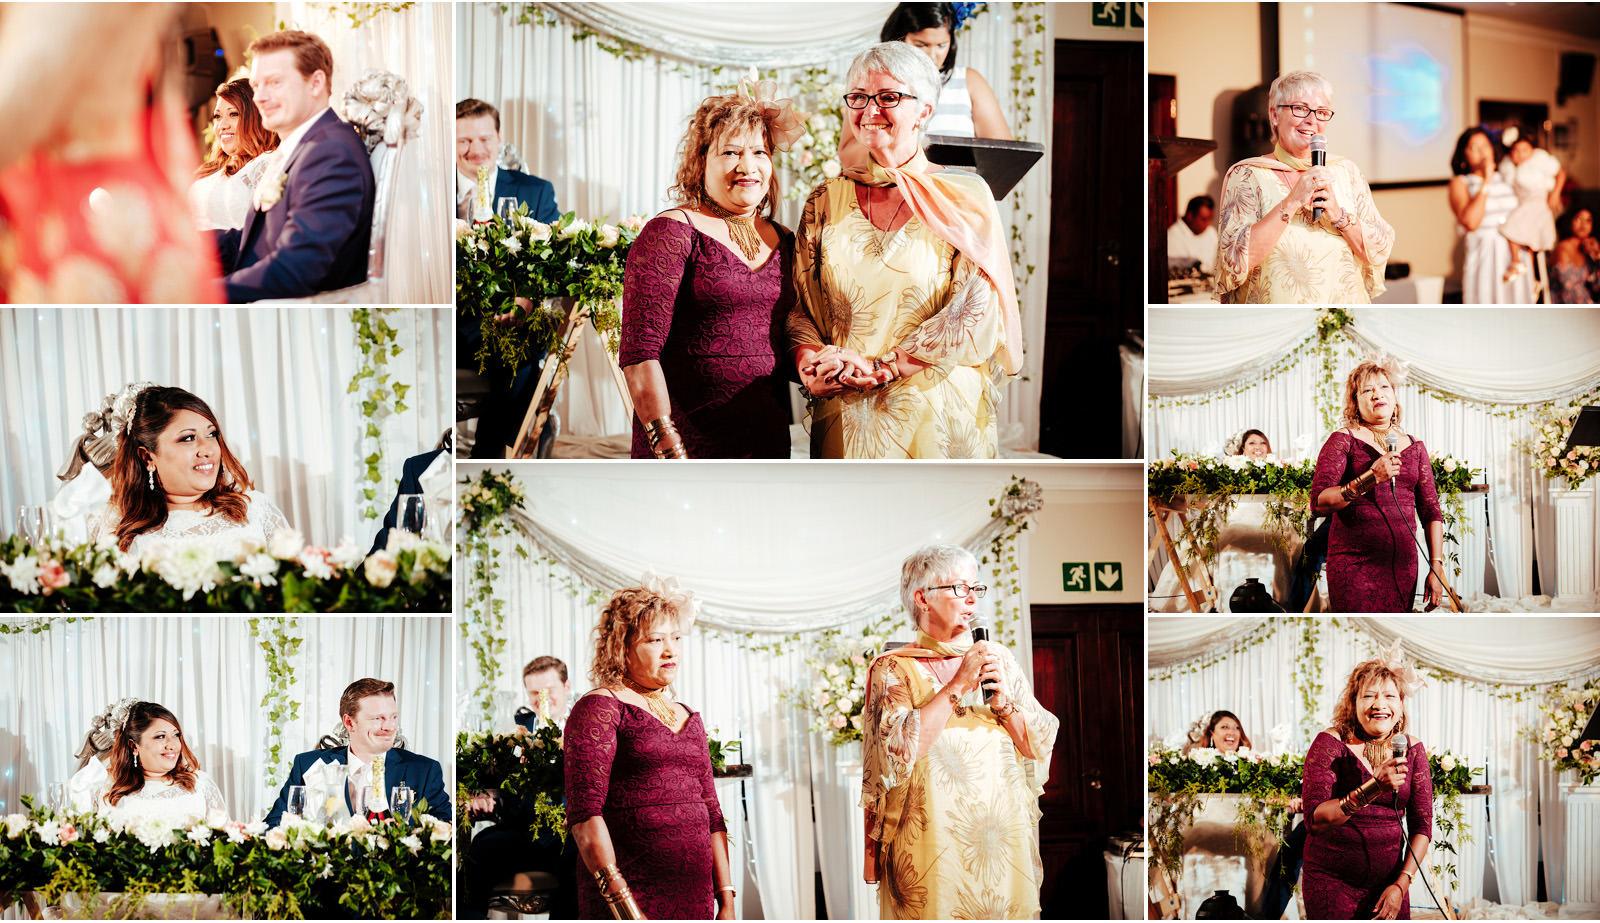 Mt Edgecombe Country Club Durban Wedding RBadal Christian Wedding